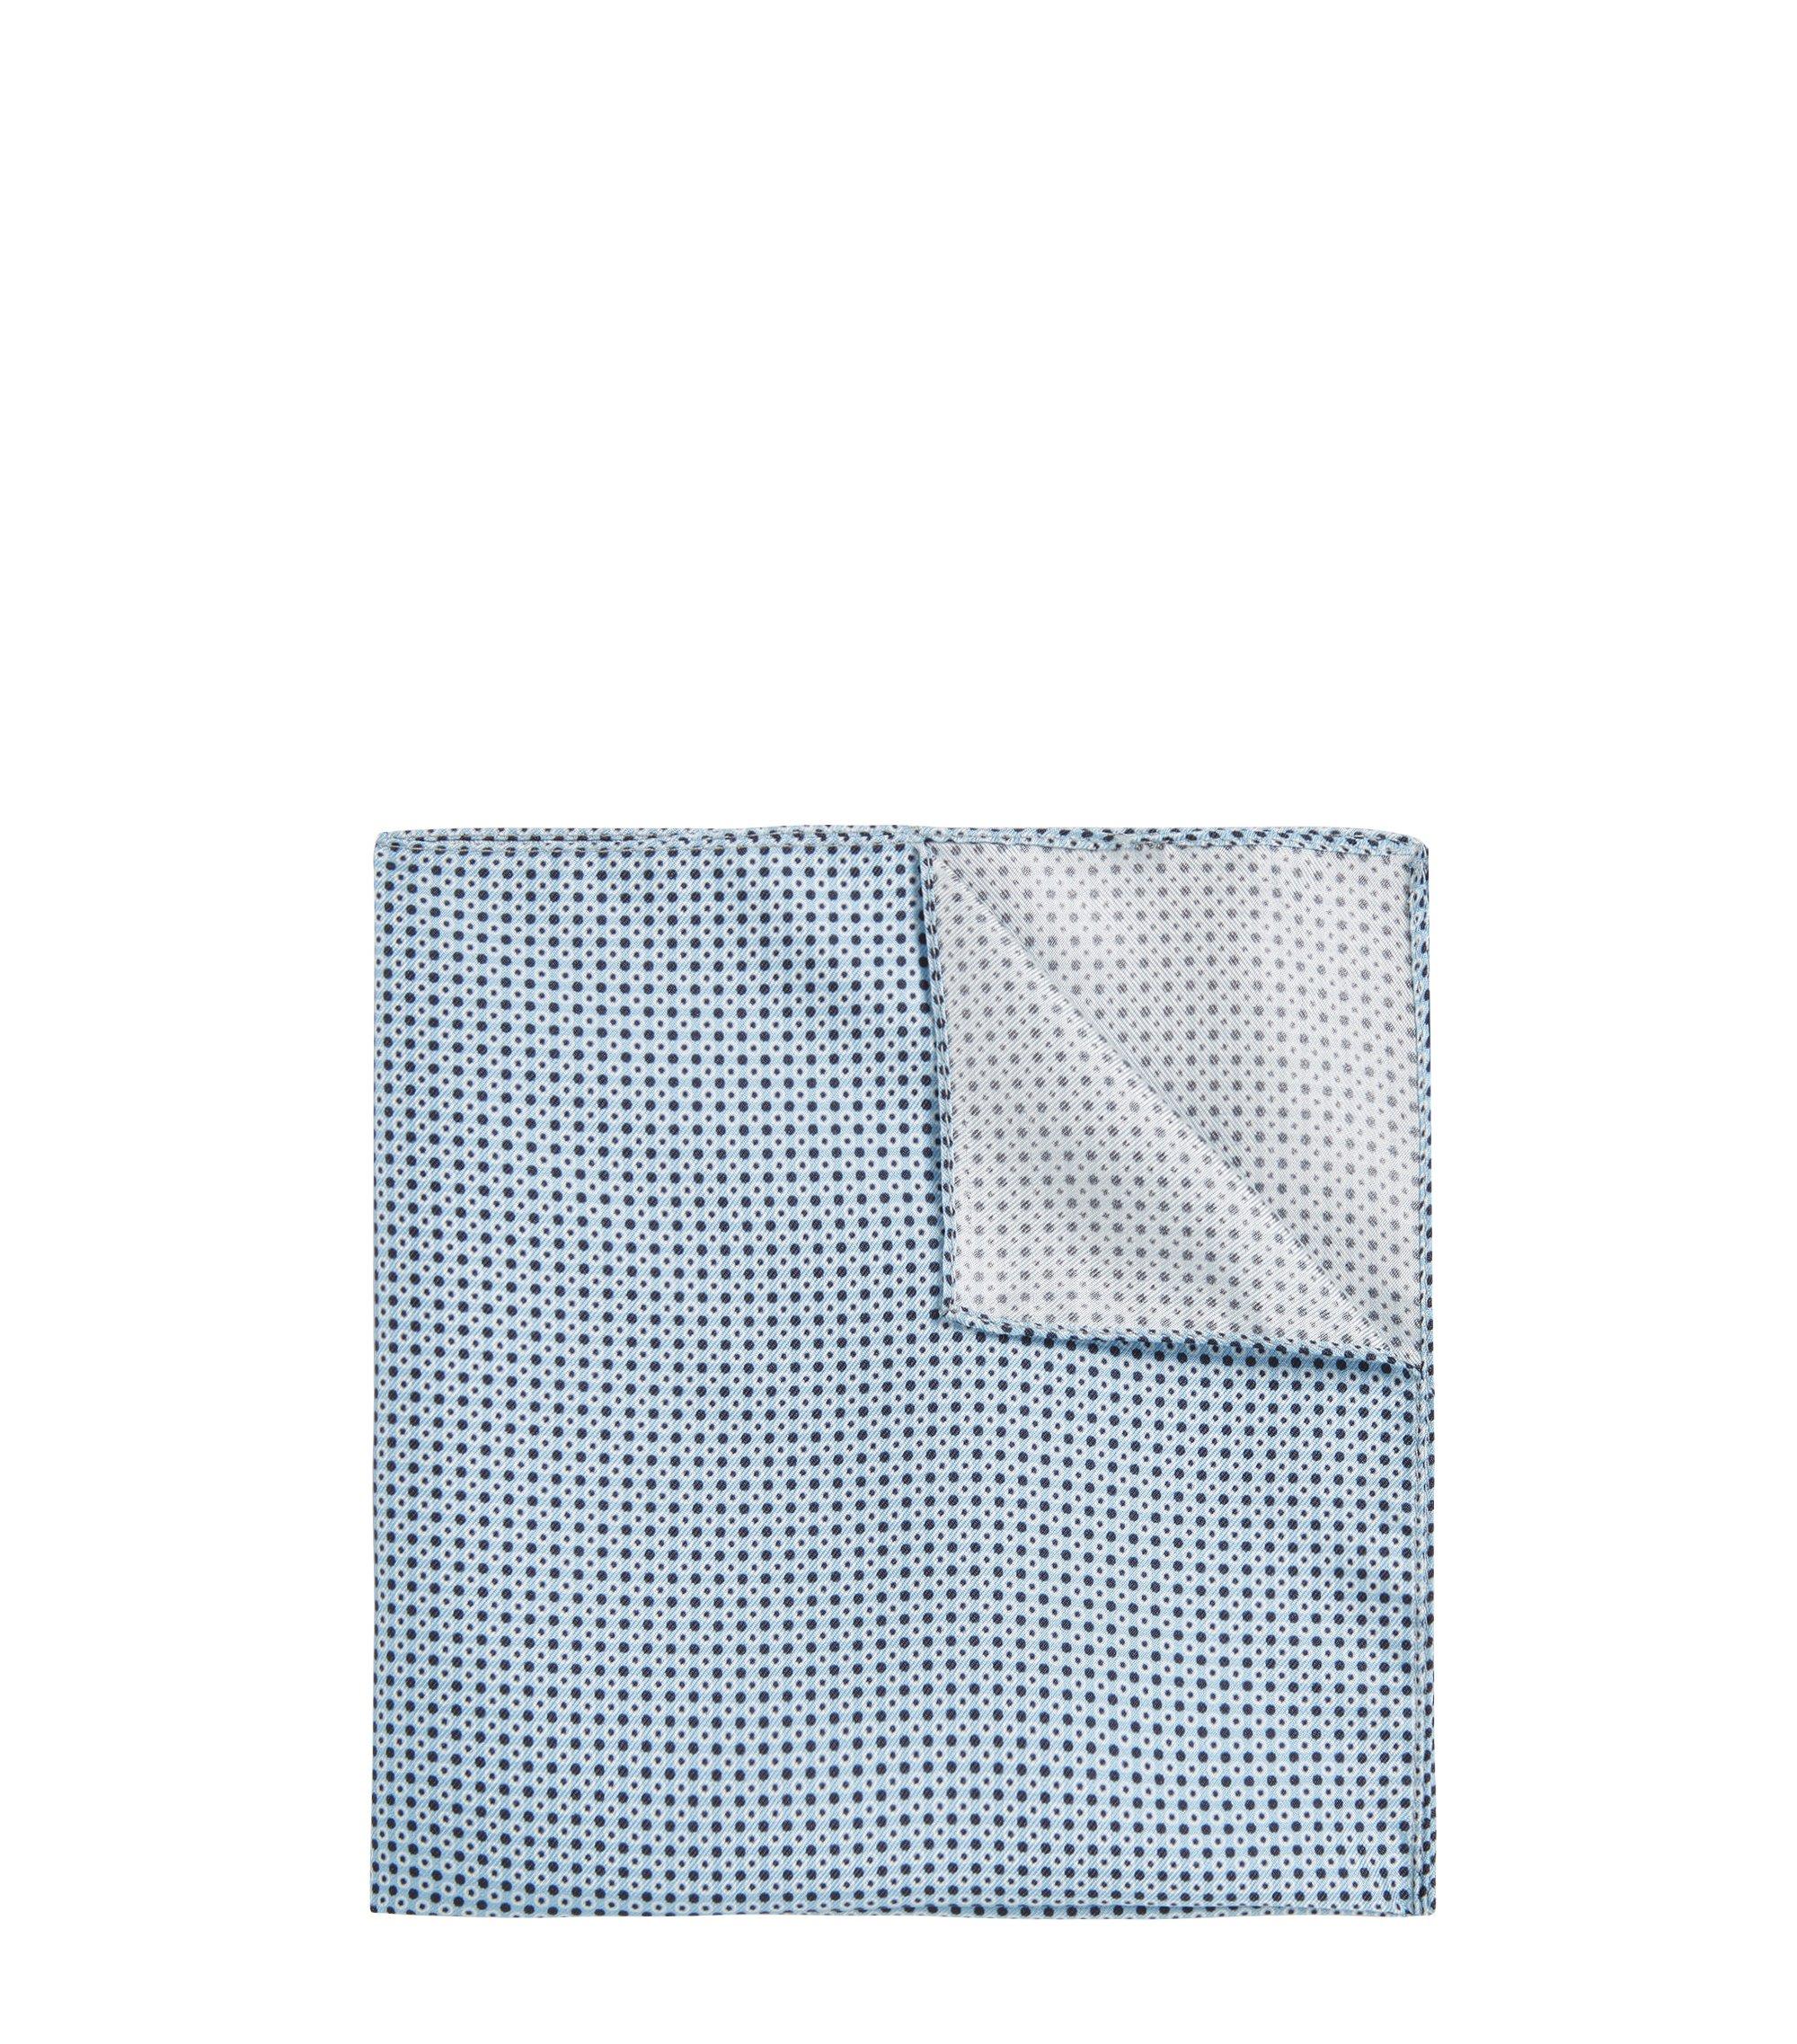 Pañuelo de bolsillo de seda con estampado geométrico, Azul oscuro